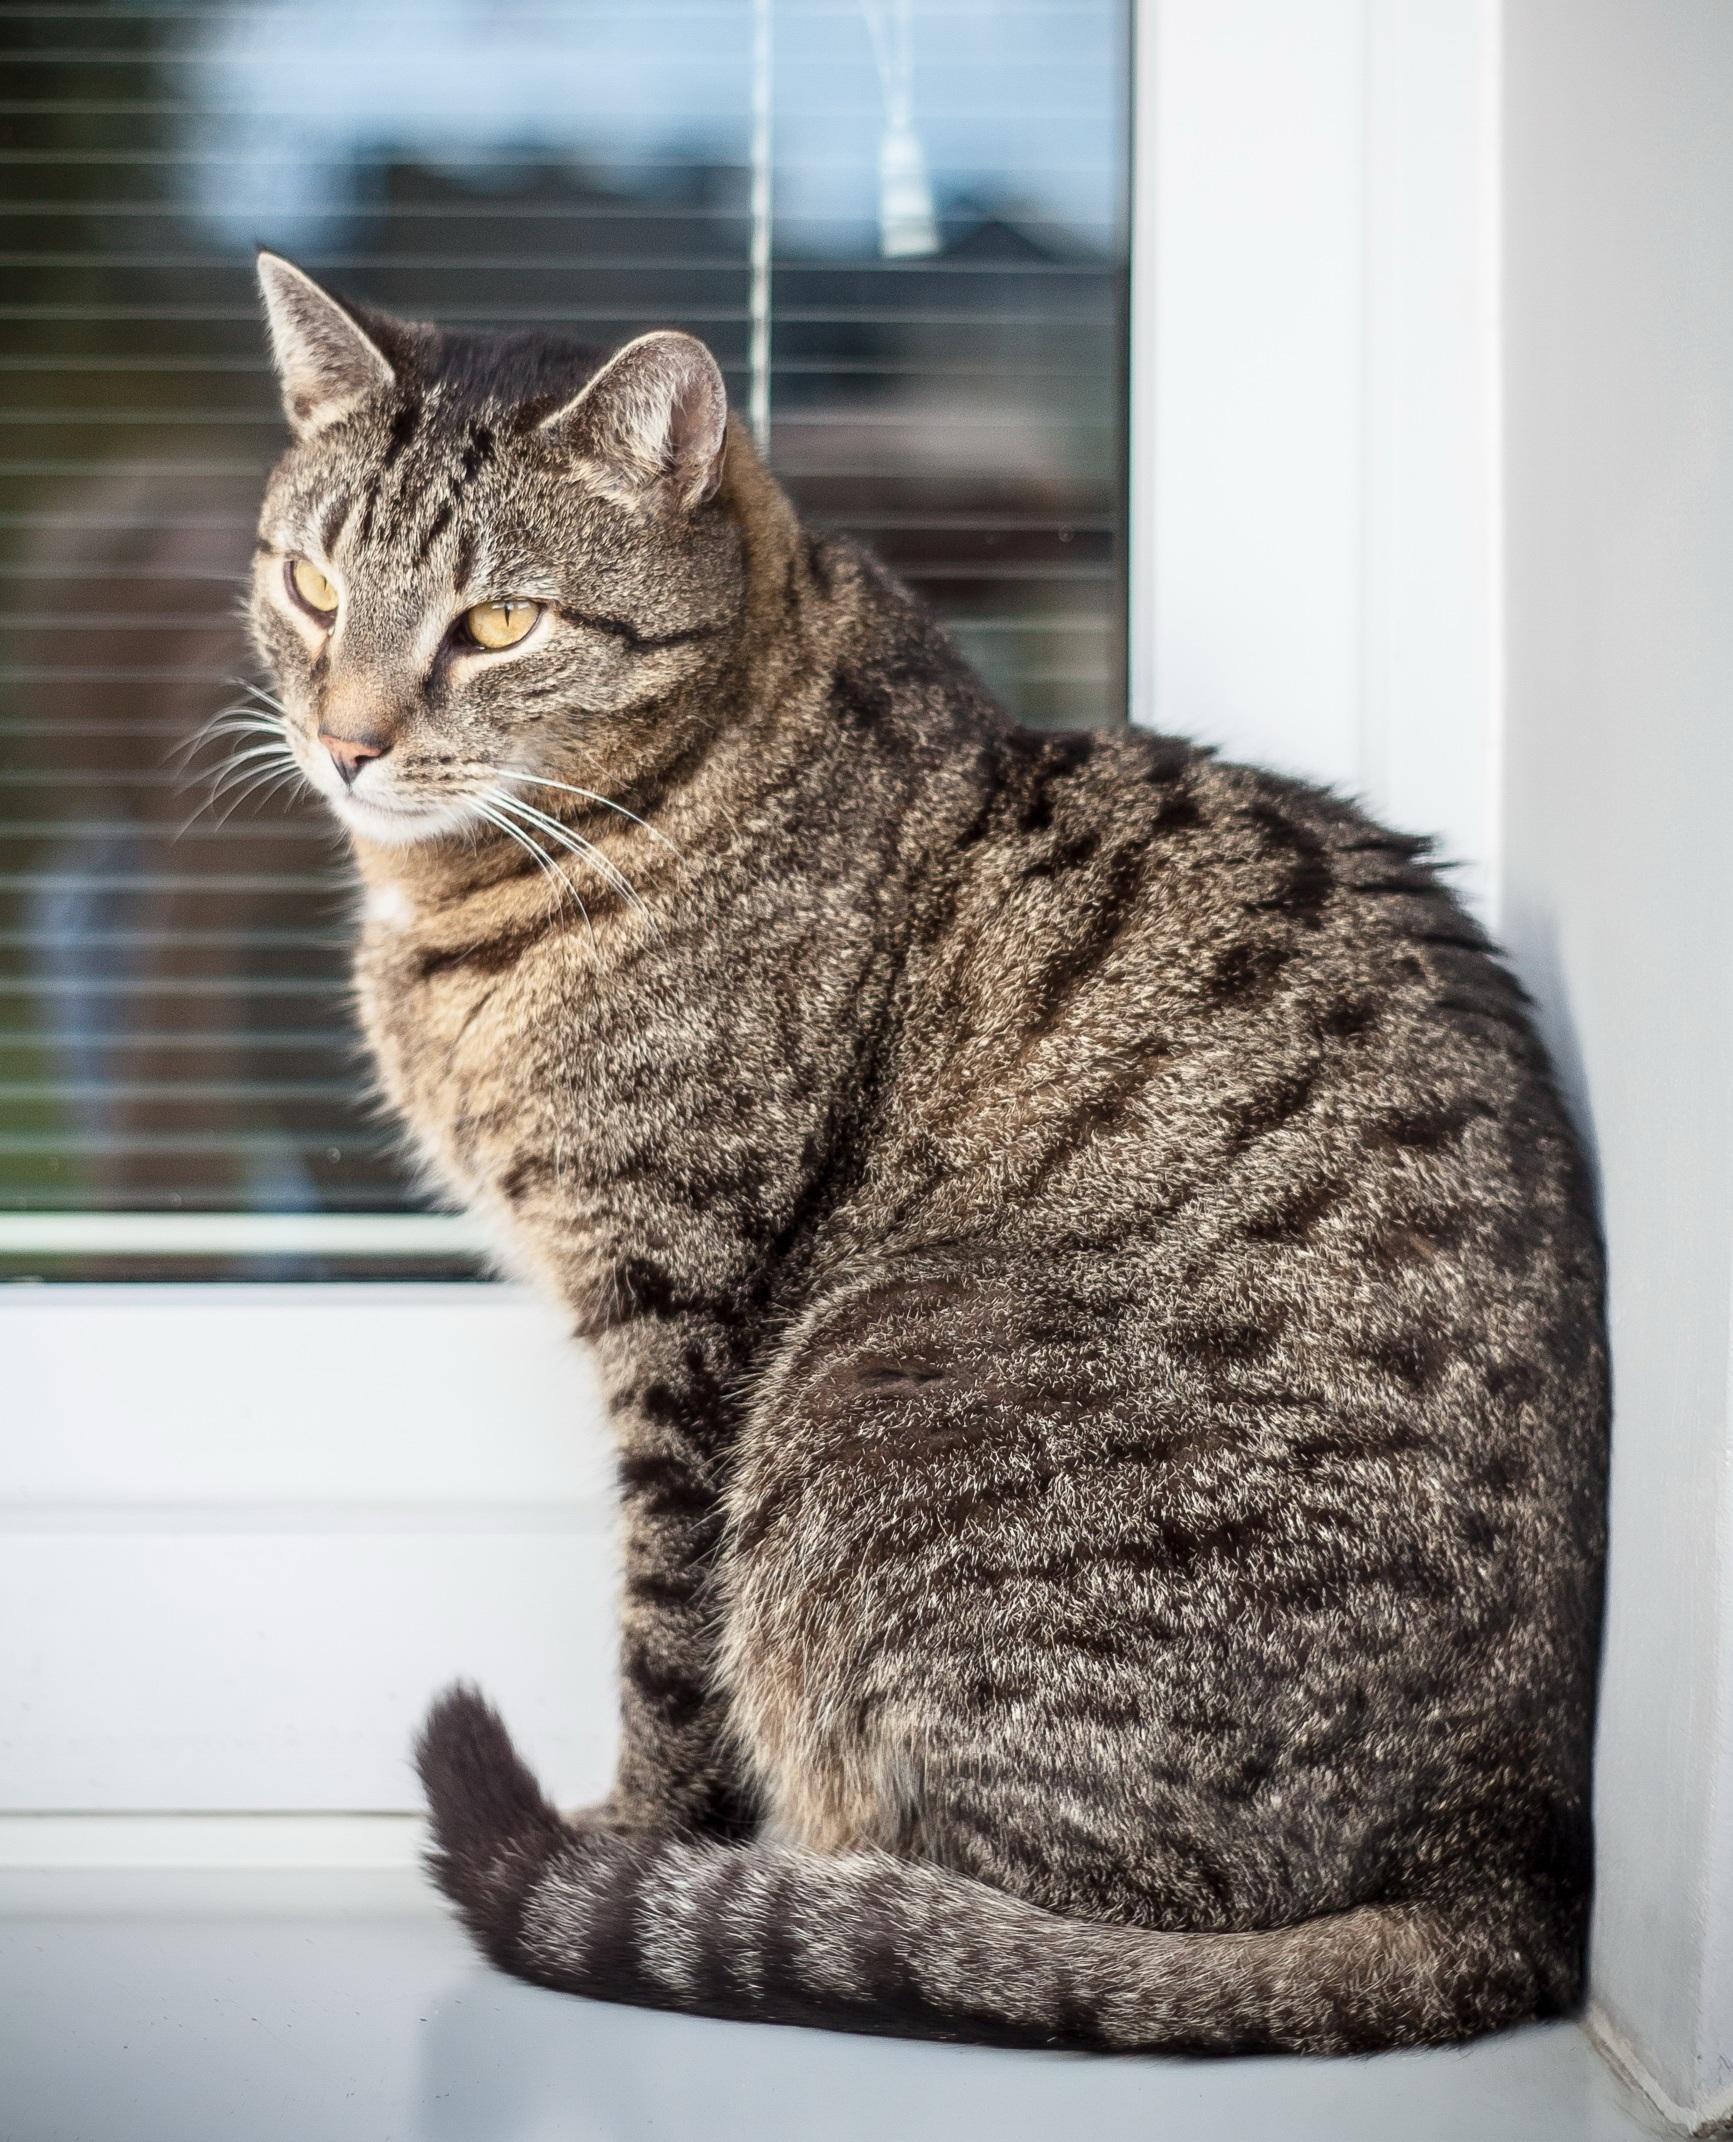 Free Images : animal, pet, fur, kitten, sitting, window sill